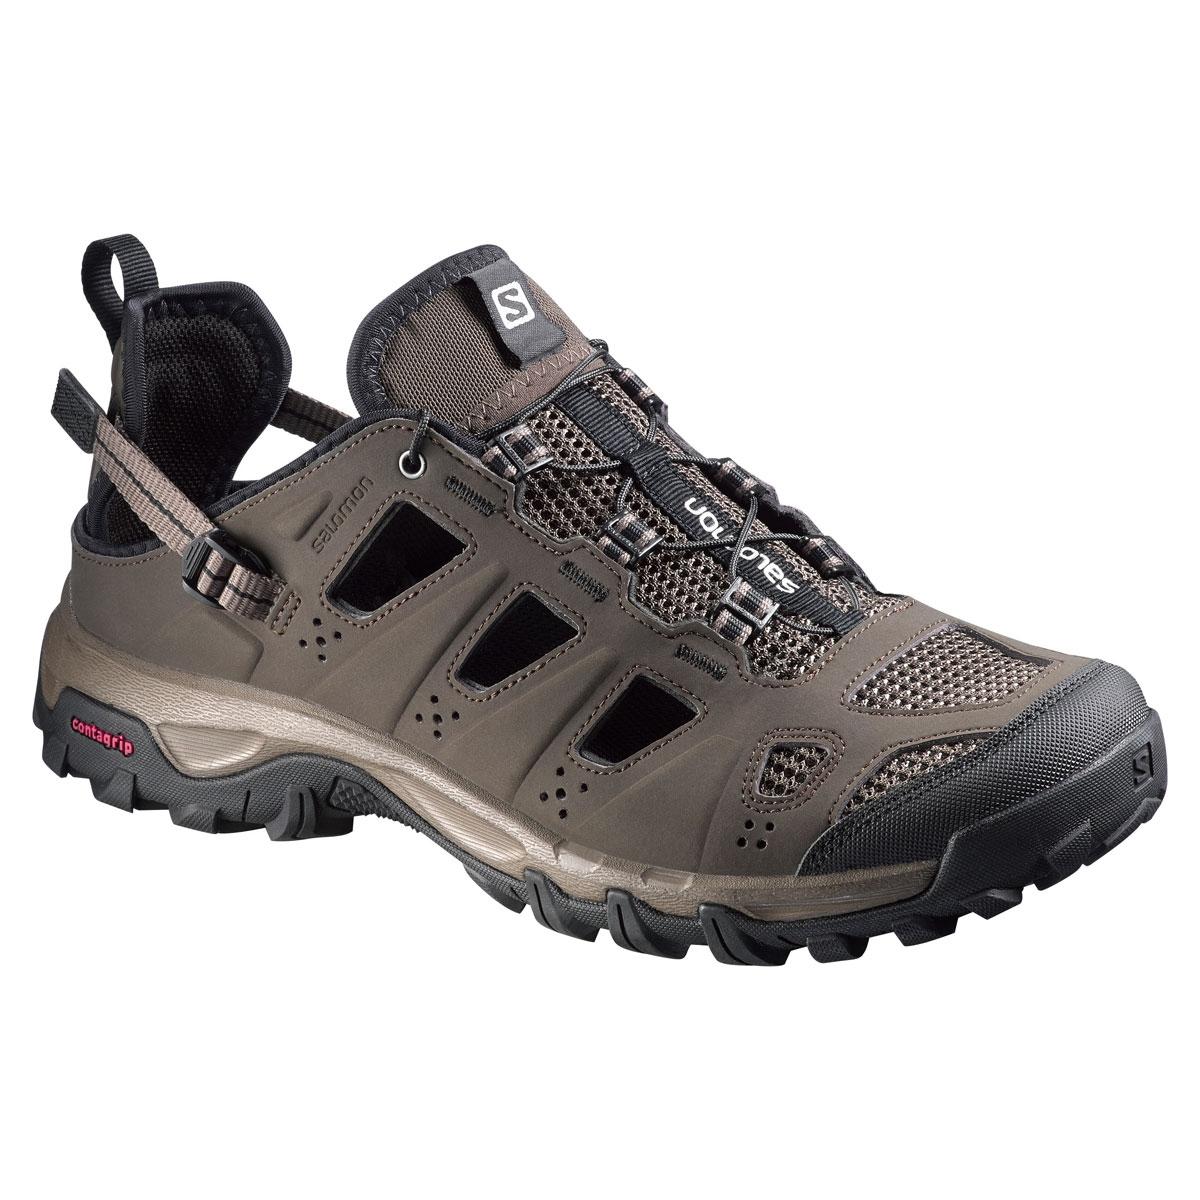 Salomon EVASION CABRIO - Walking sandals - absolute brown-x/burro/black 1440EuwwK0